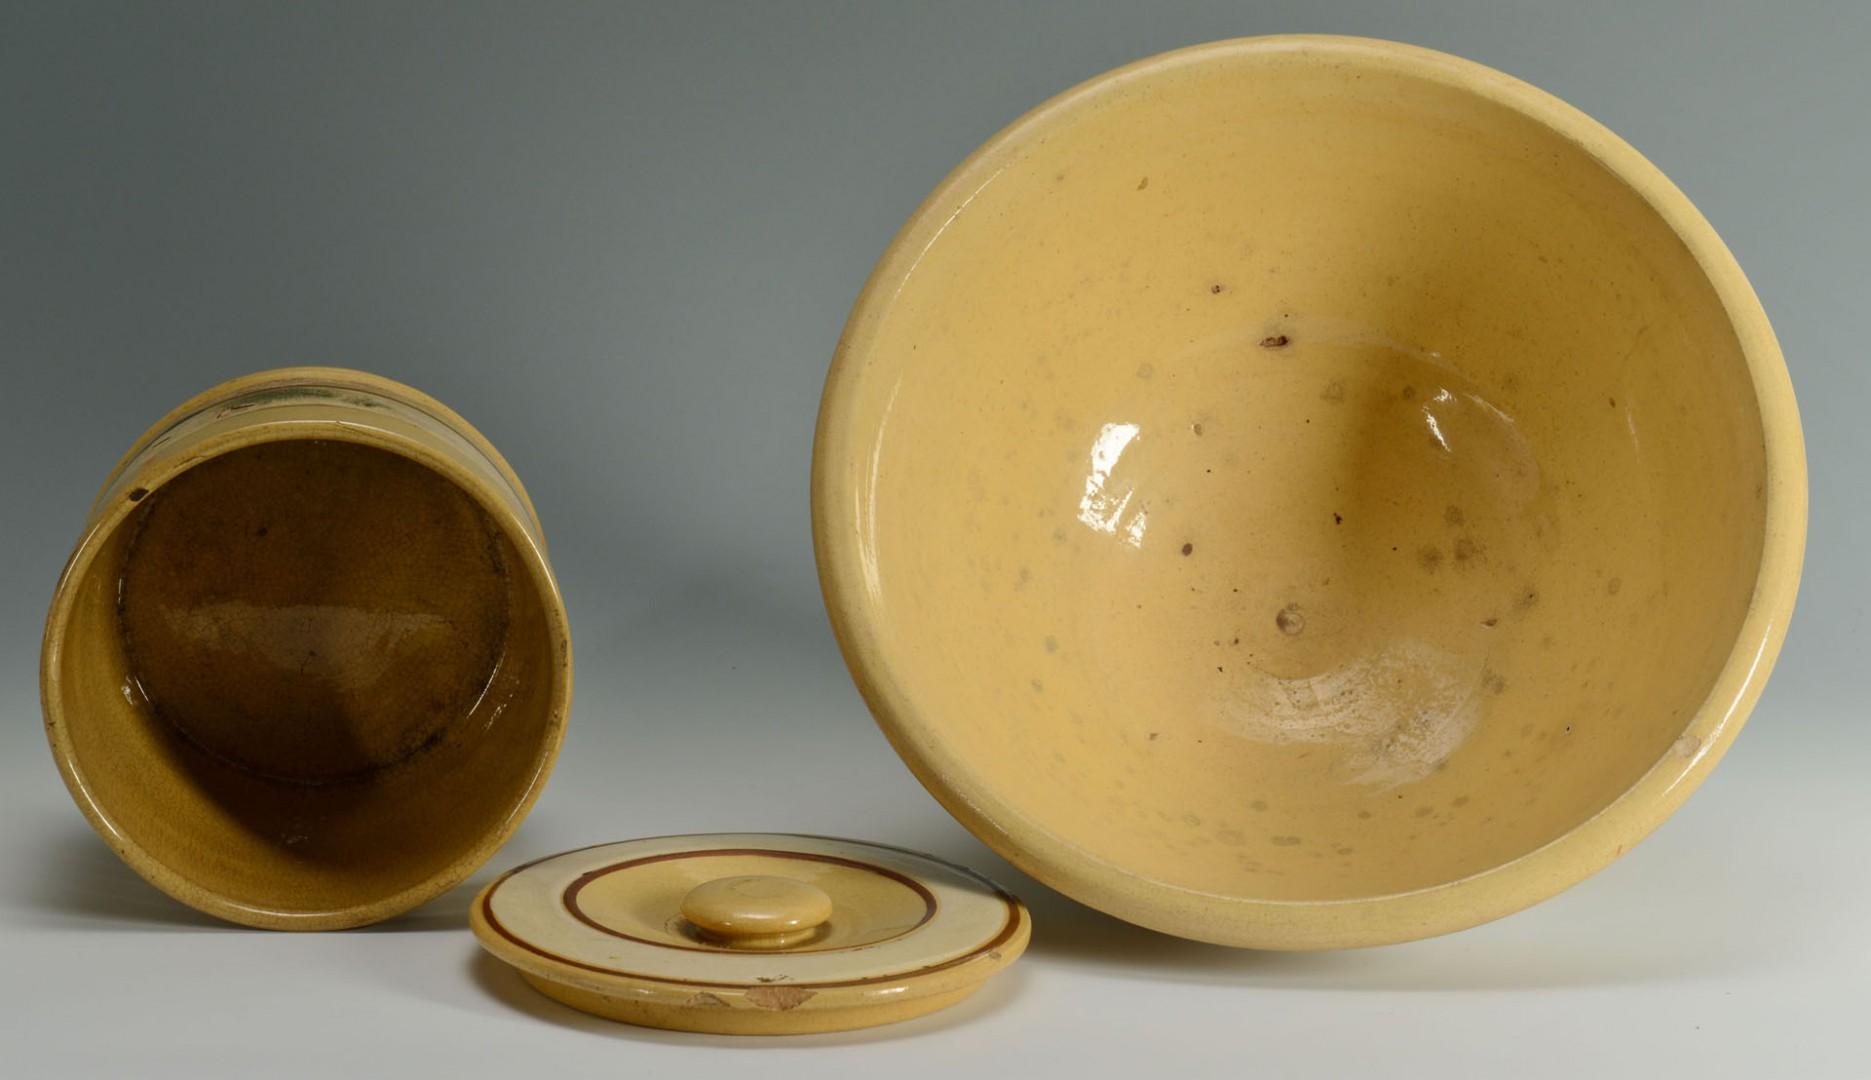 Lot 446: 5 Pieces of Yellowware mocha seaweed patt.